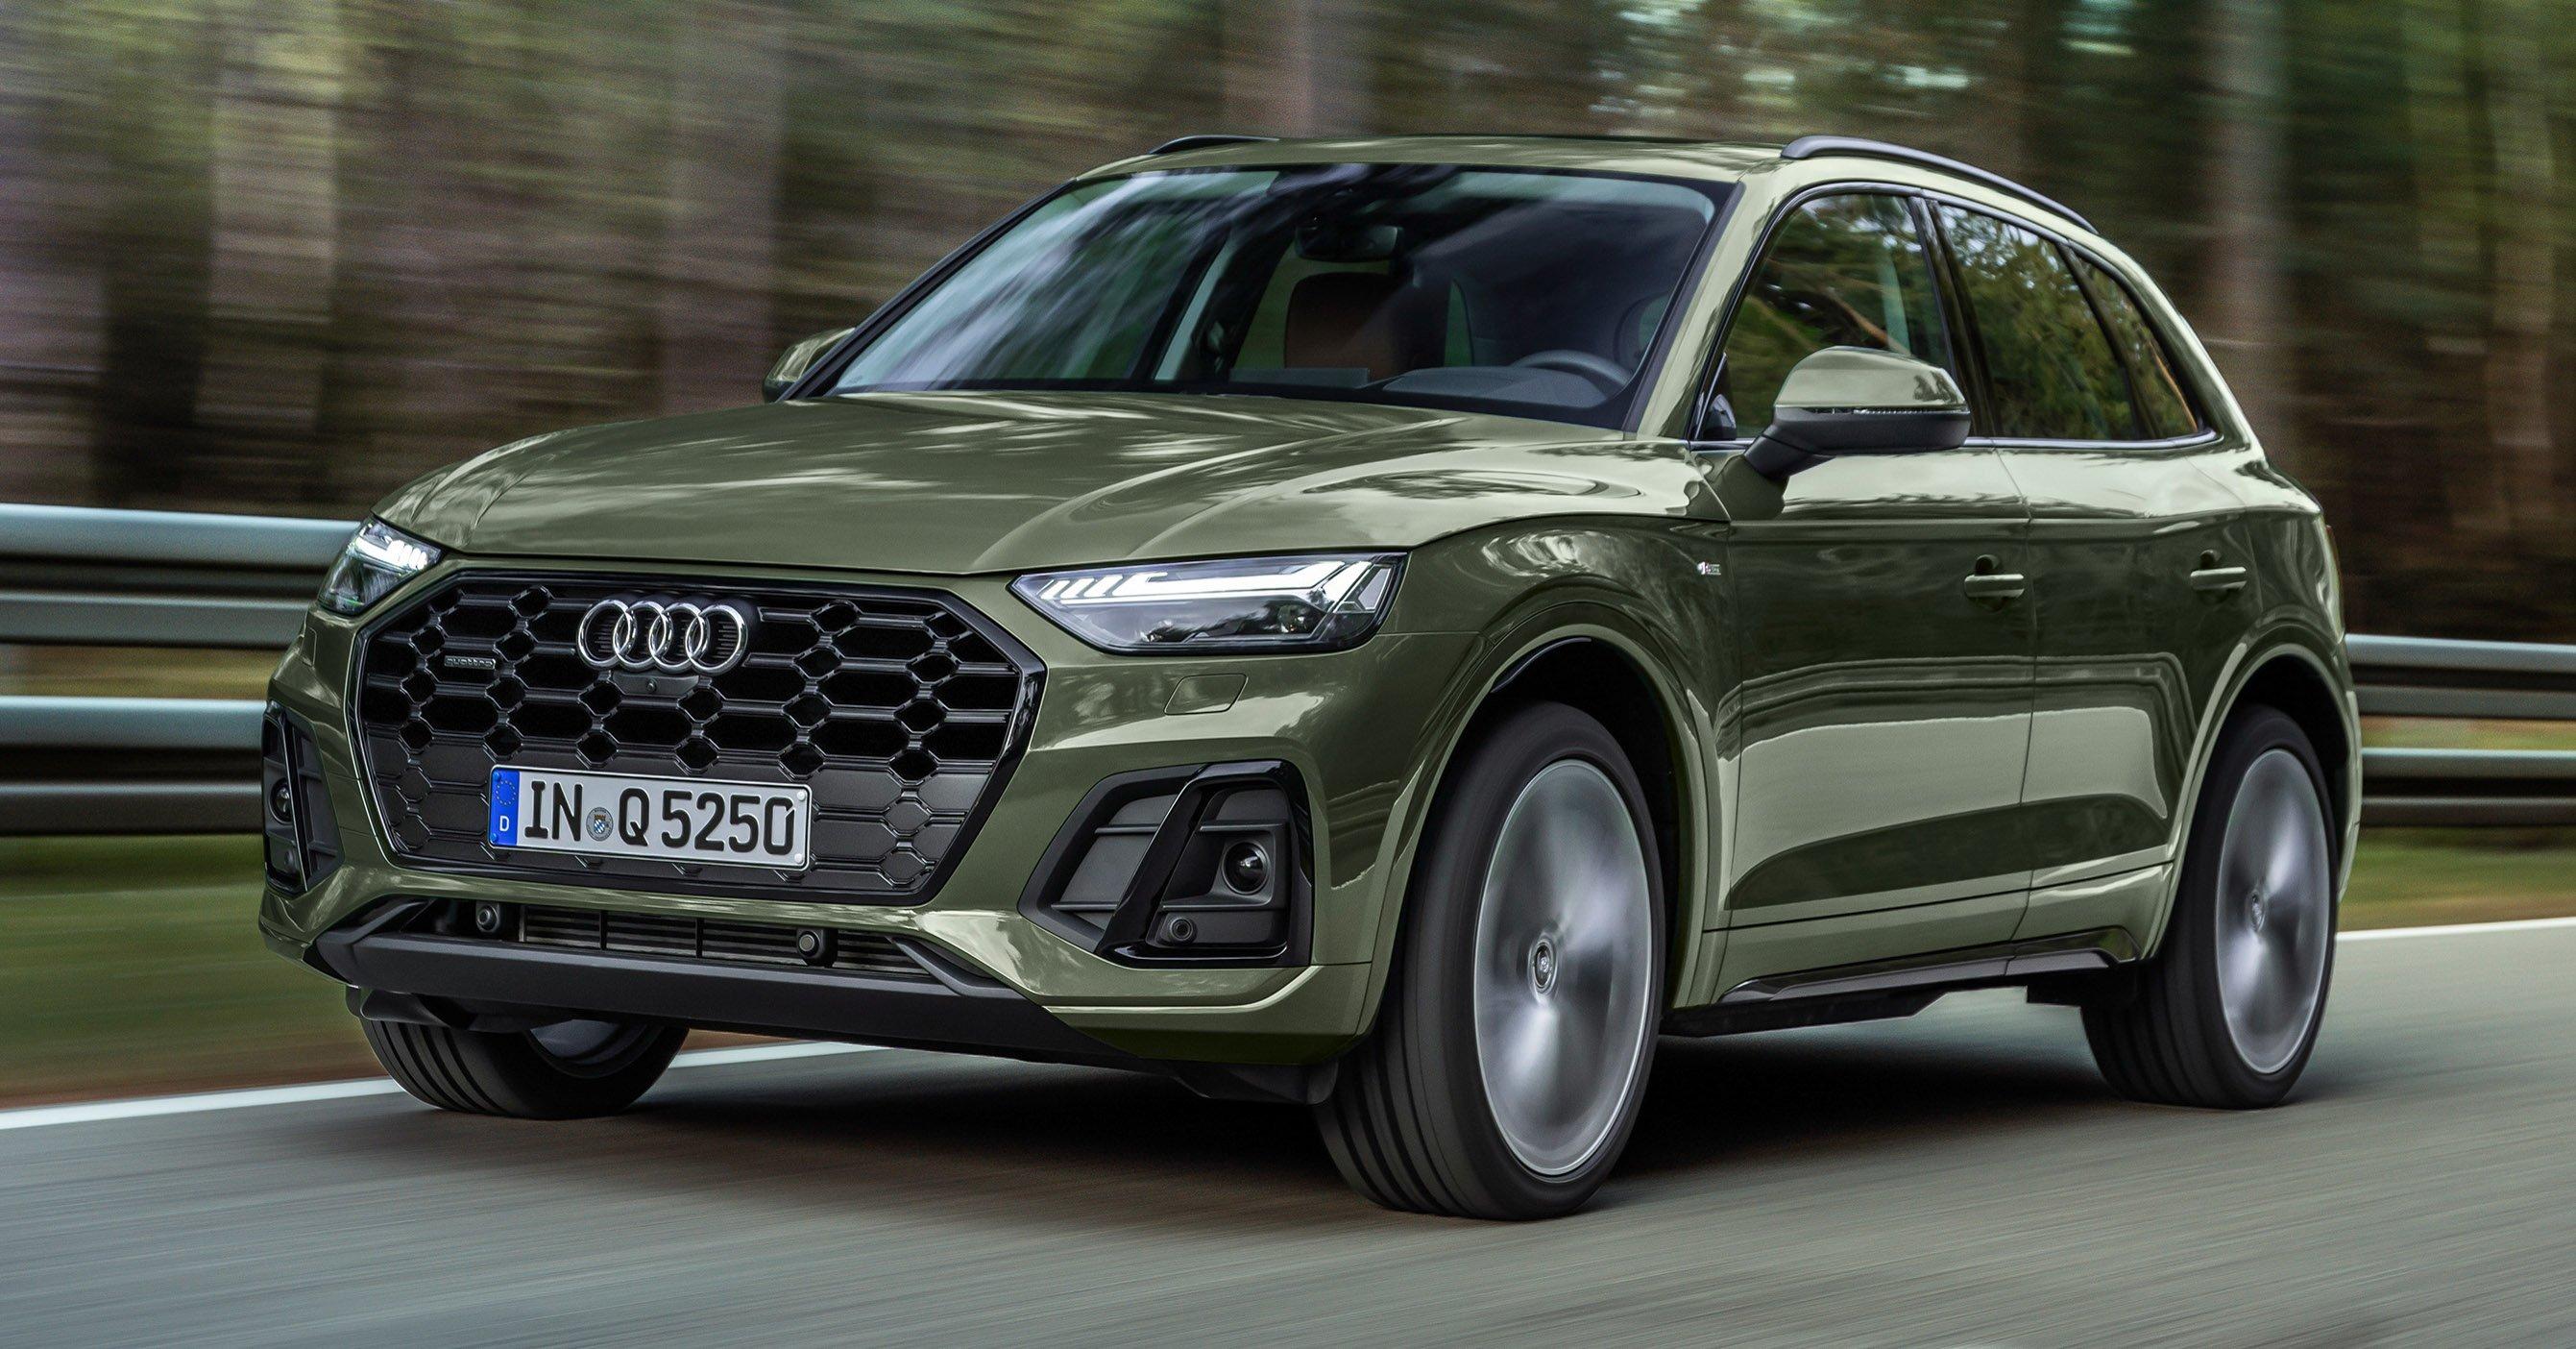 2020 Audi Q5 Facelift Debuts Updated Styling Mib3 Infotainment System Mild Hybrid Phev Powertrains Paultan Org